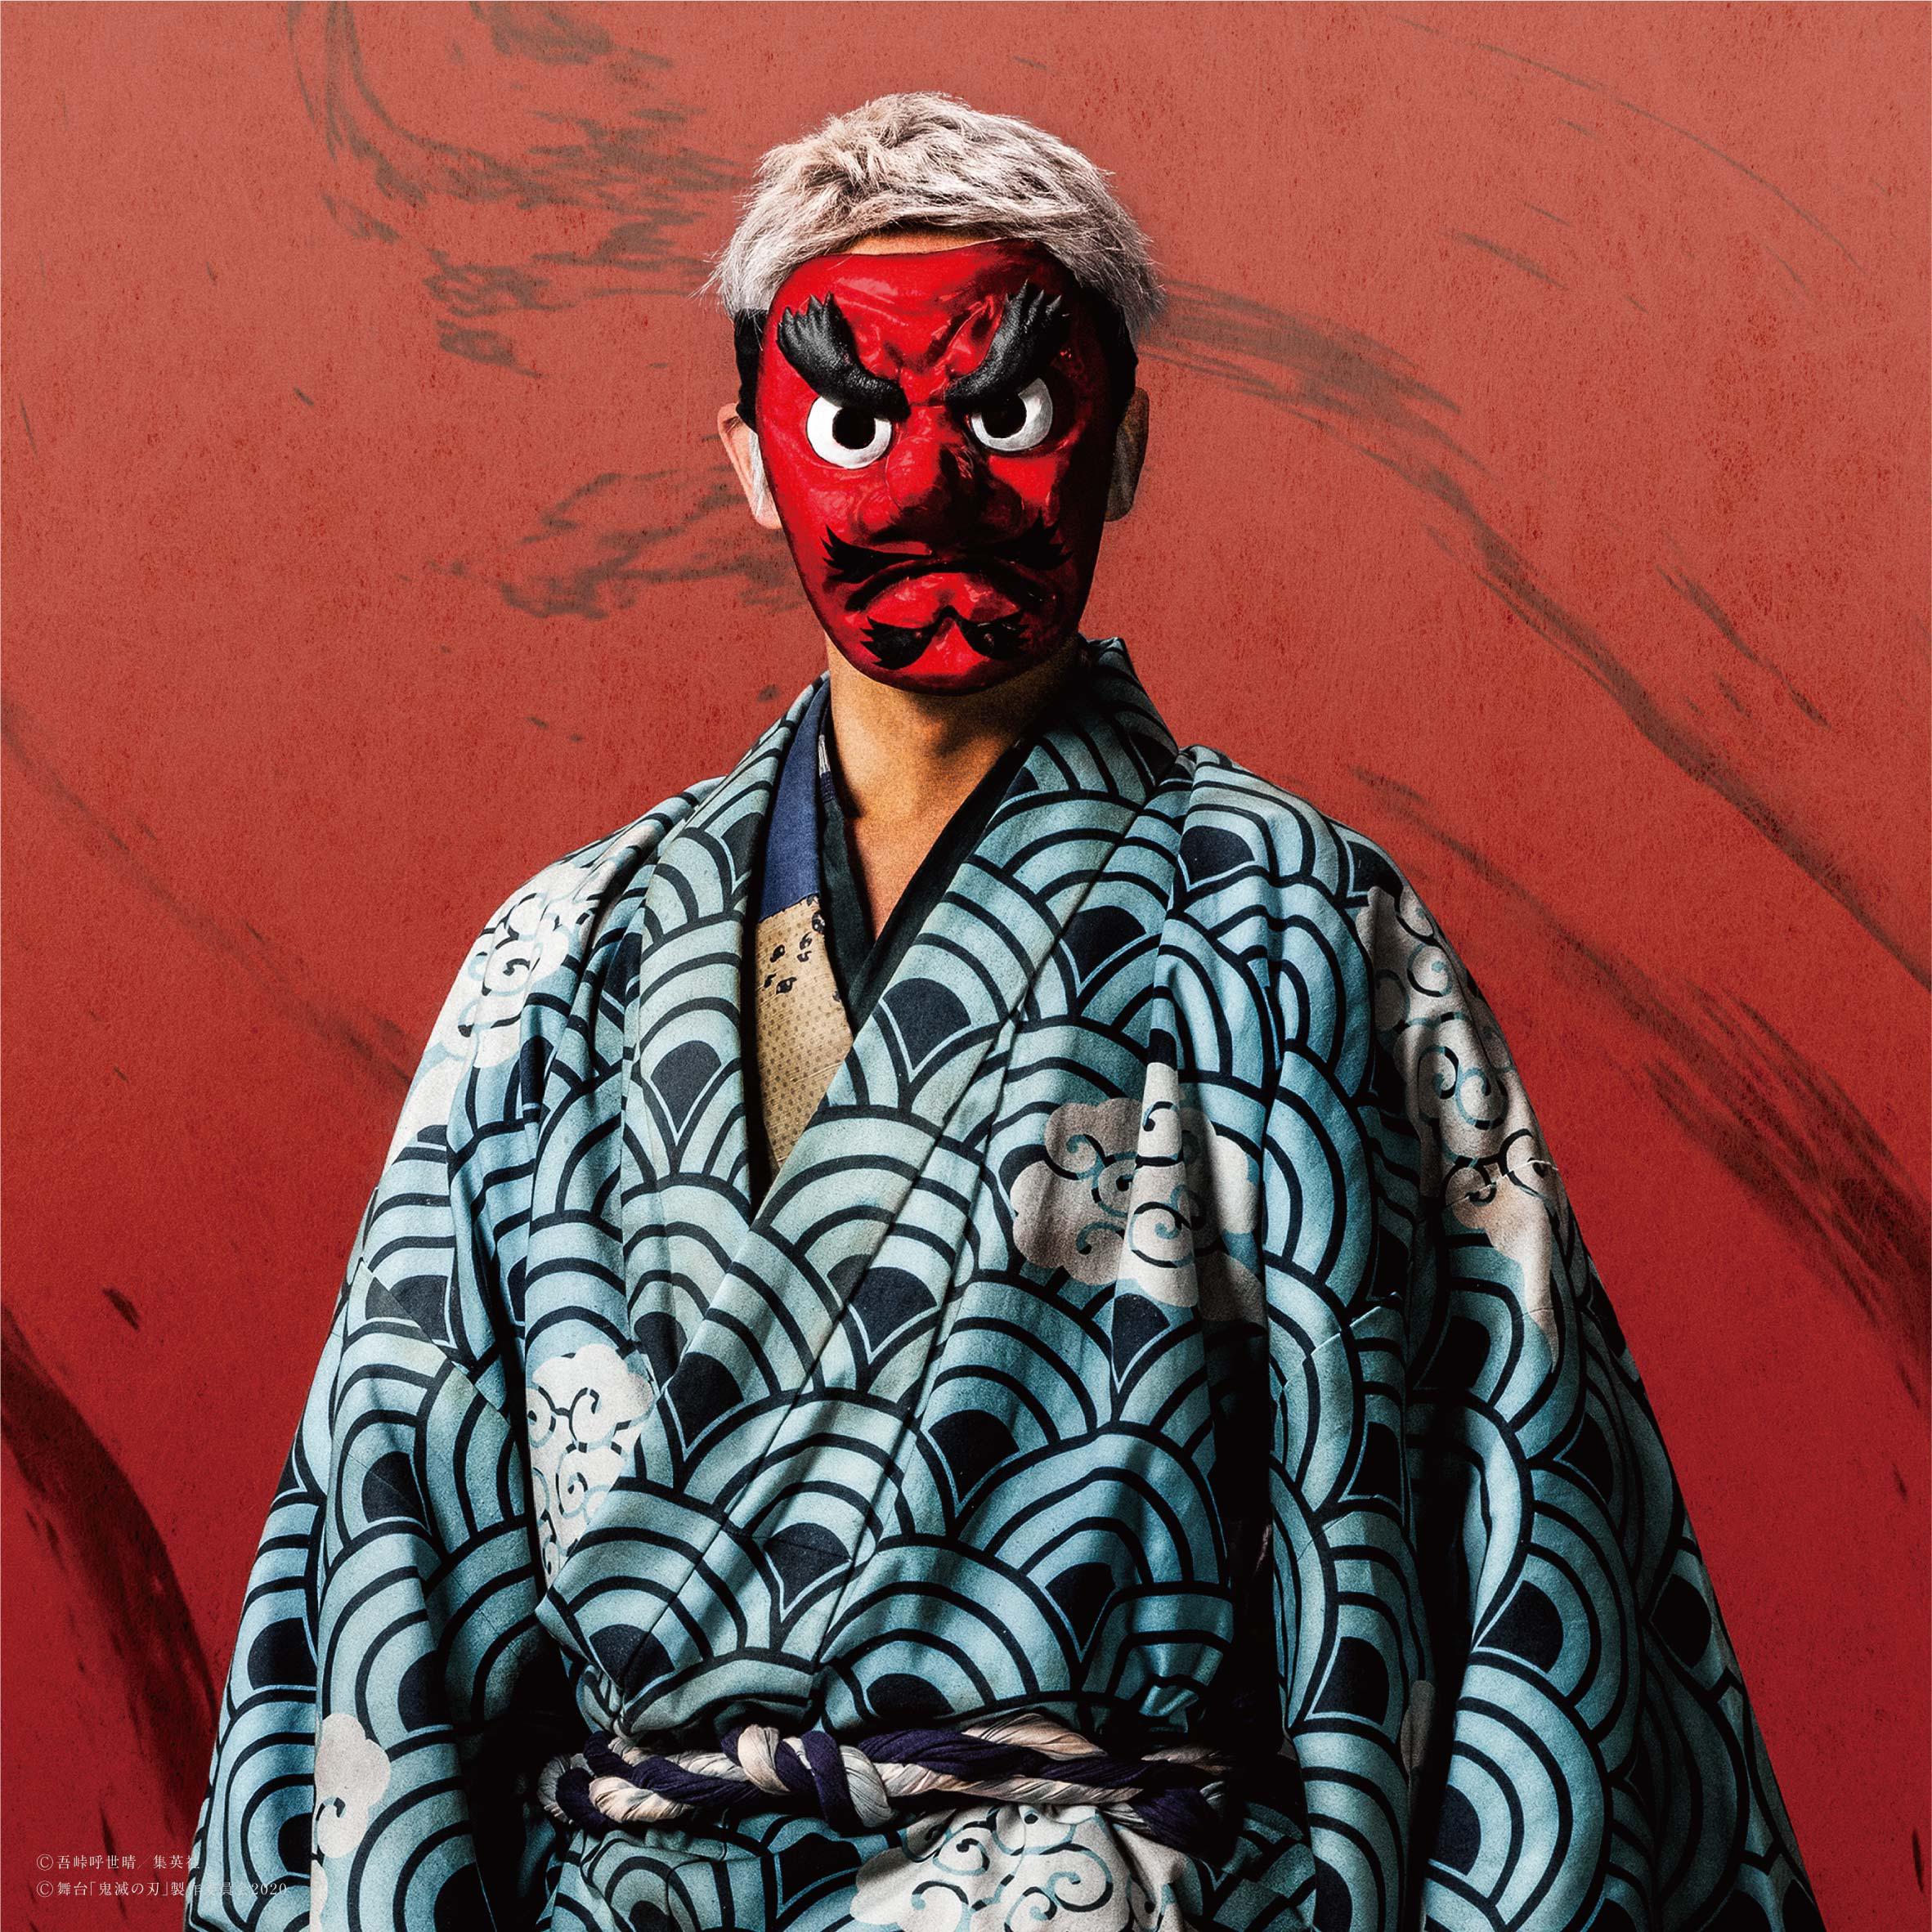 Details about  /Kimetsu no Yaiba Sakonji Urokodaki Cosplay Costume Outfit